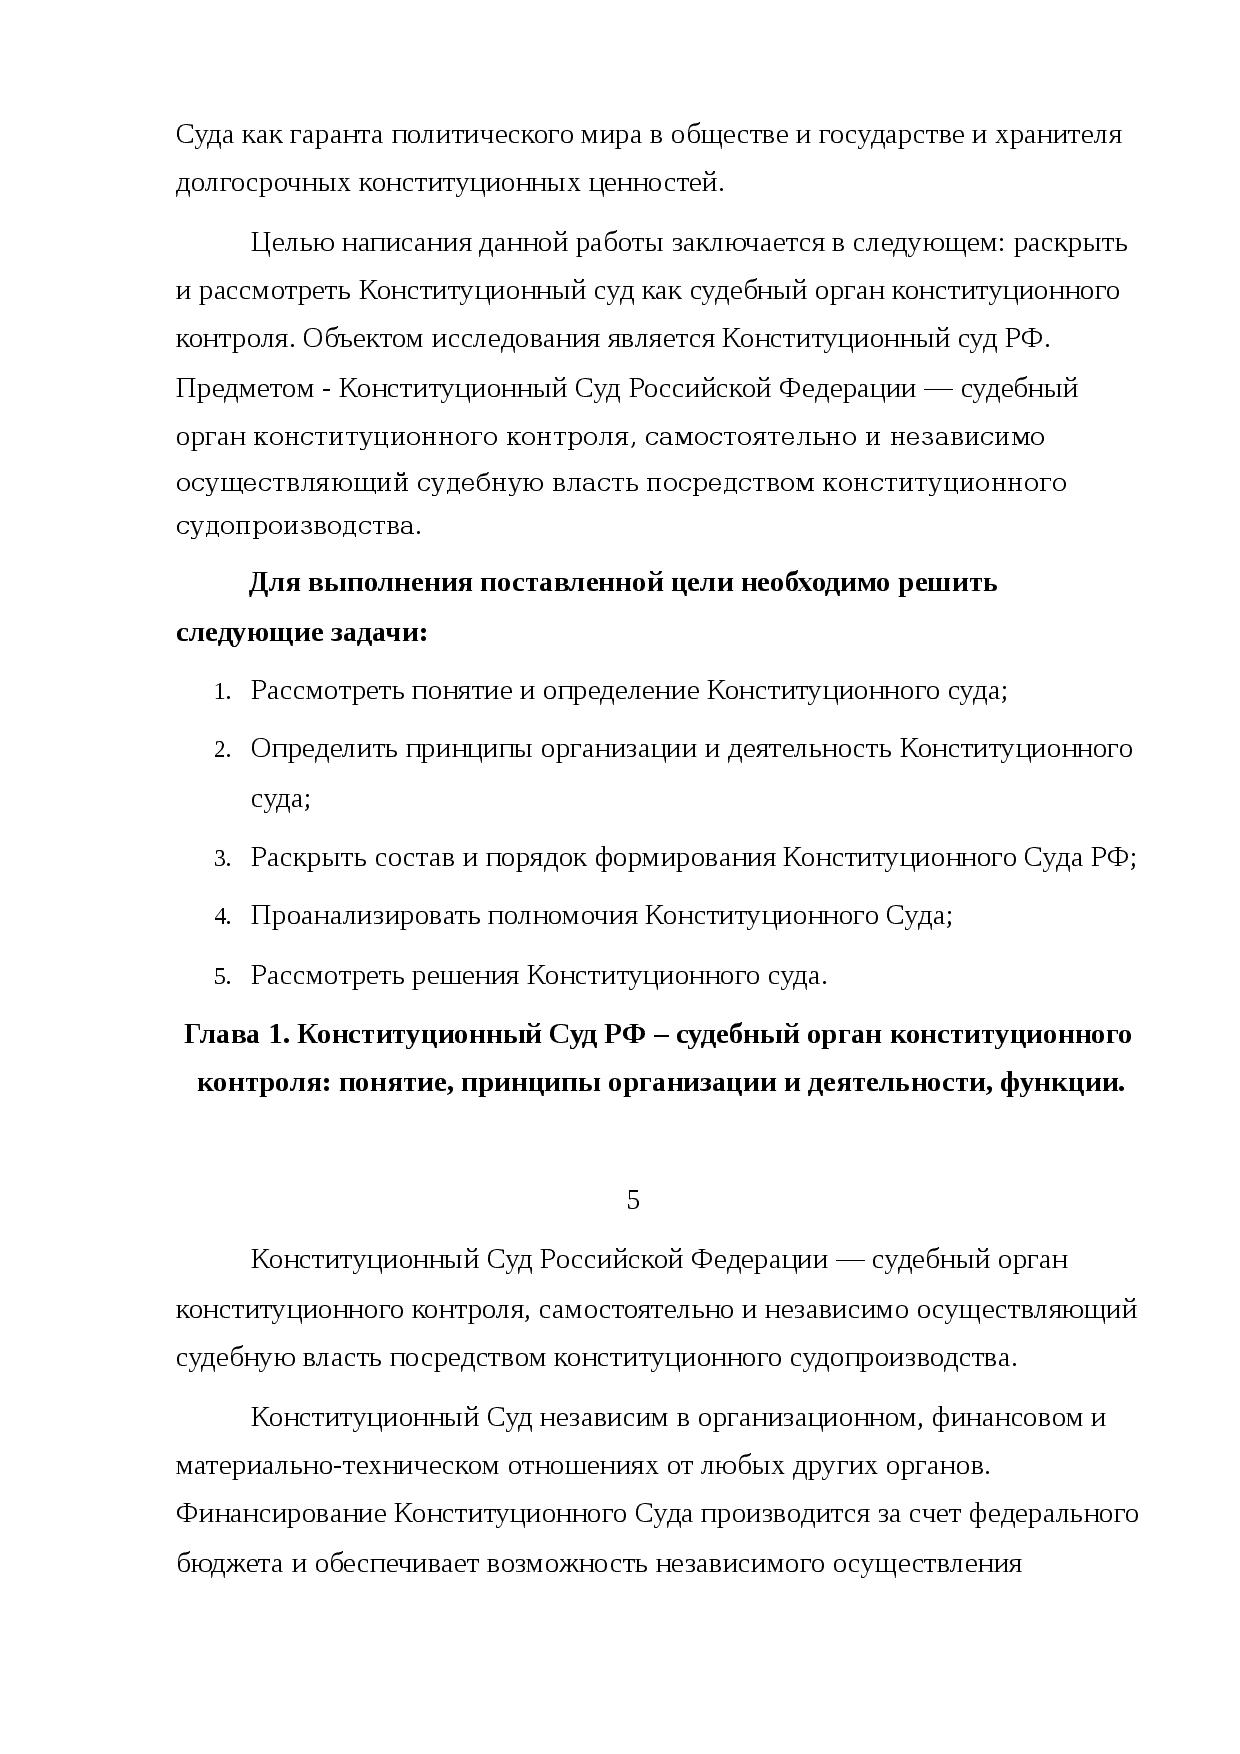 функции конституционного суда рф